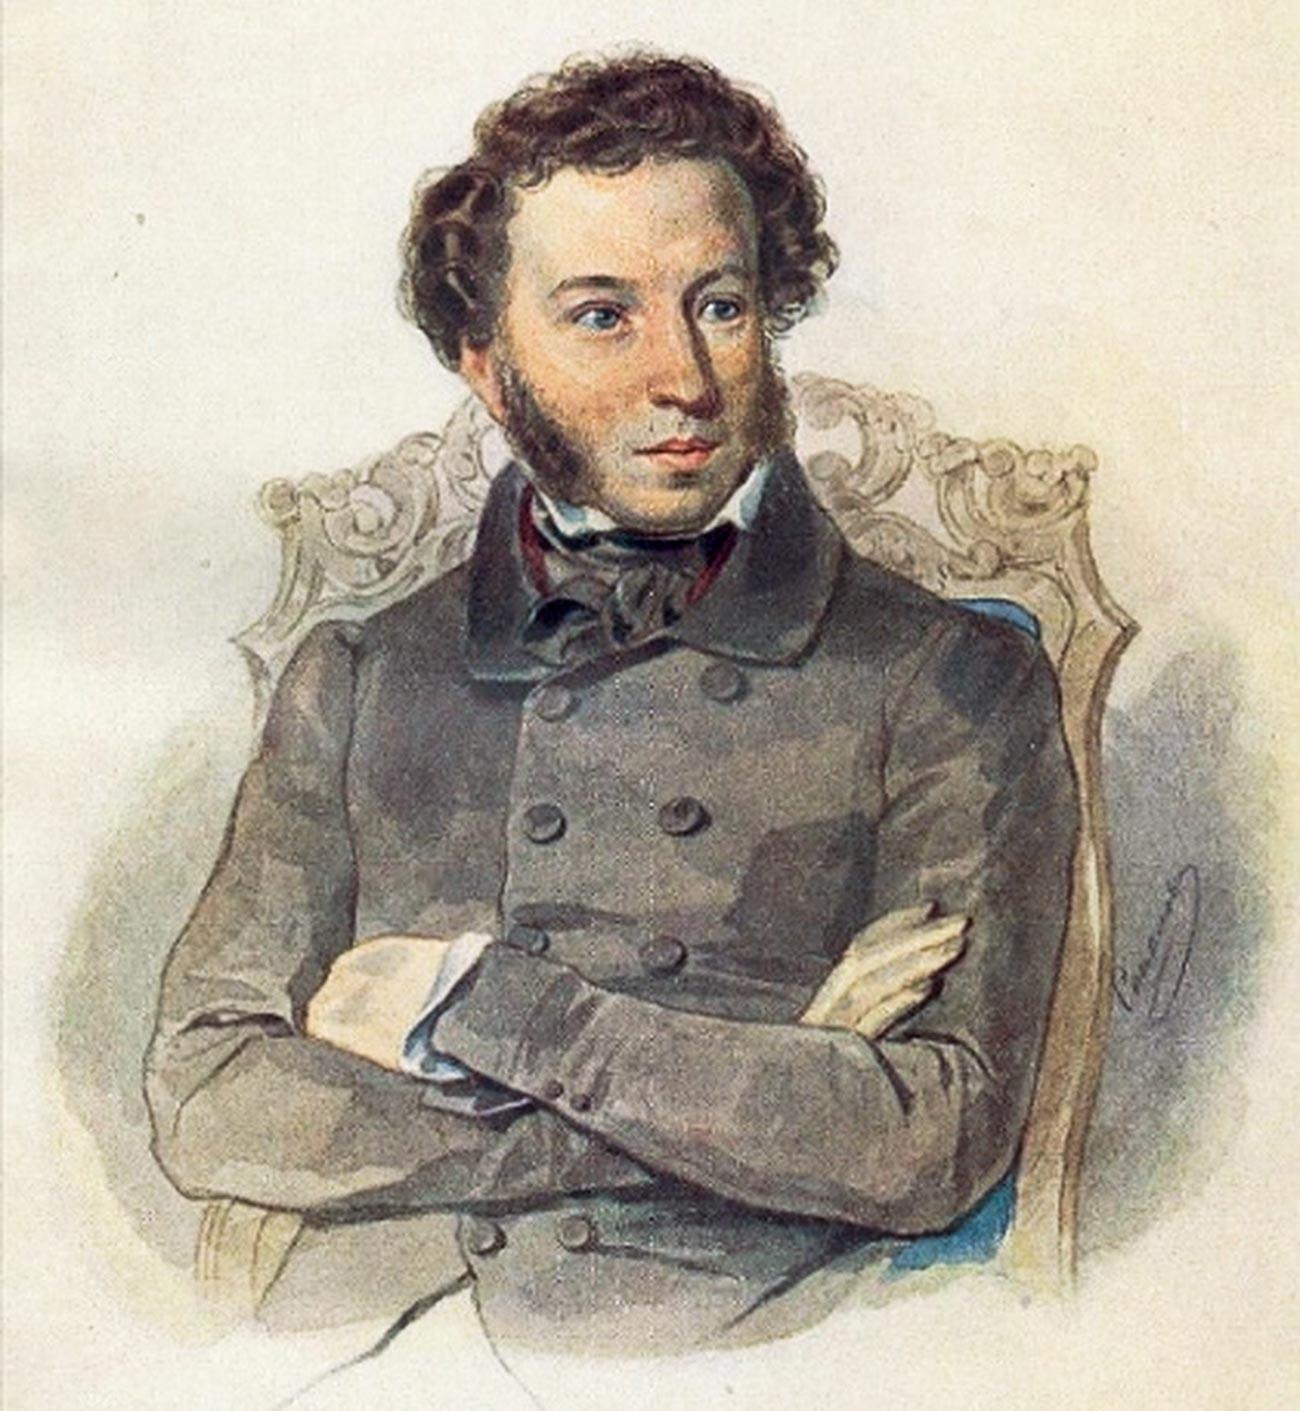 Portrait of Alexander Pushkin, by Pyotr Sokolov, 1836.